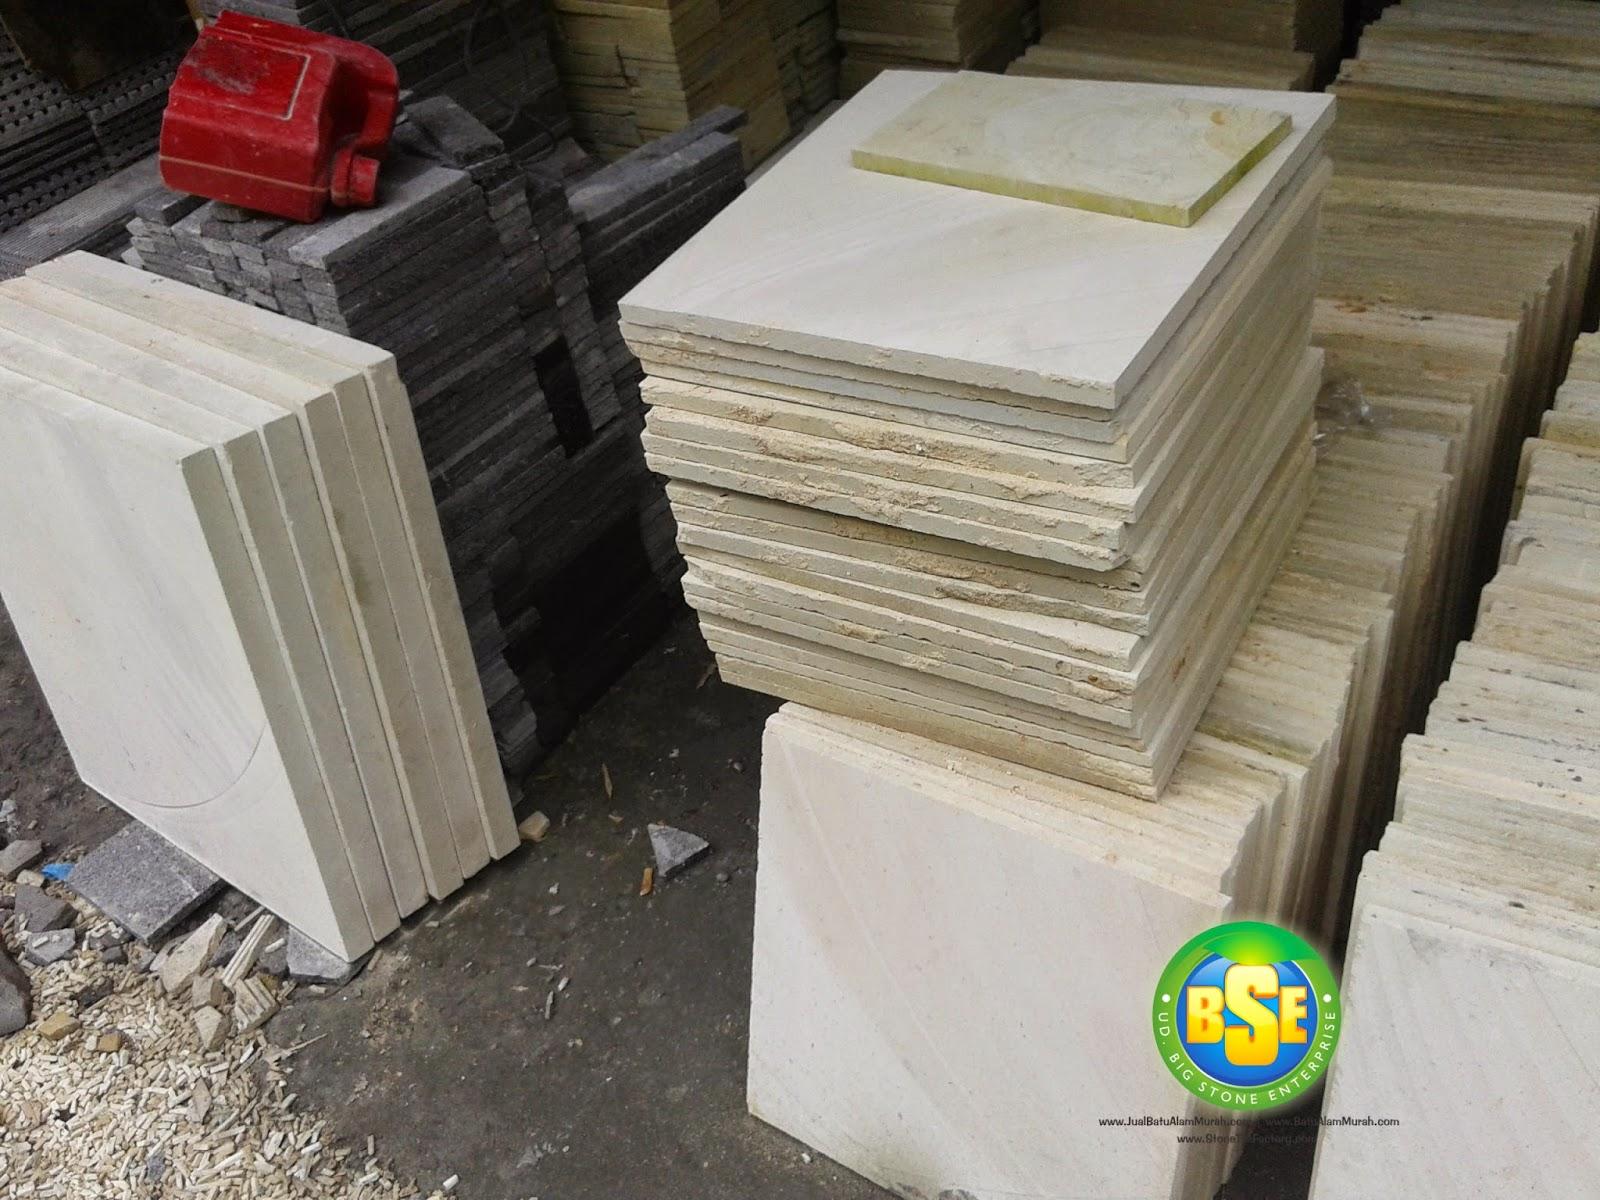 Jual Batu Alam Murah Supplier Batu Alam Candi Pabrik Batu Alam Batu Andesit Batu Paras Batu